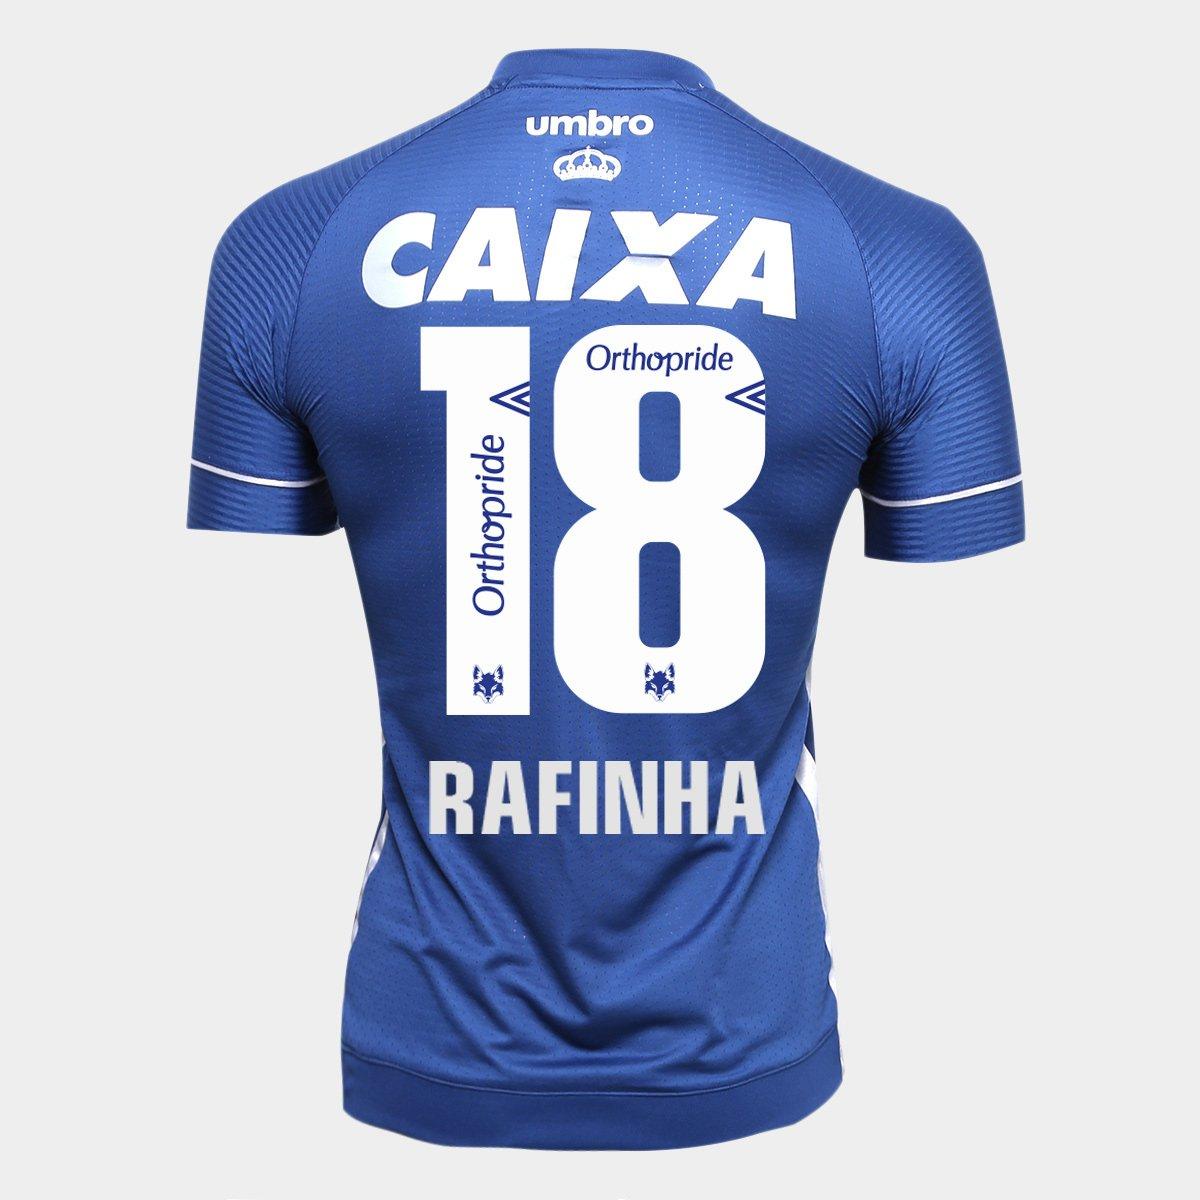 Camisa Cruzeiro III 17 18 N° 18 Rafinha Torcedor Umbro Masculina ... 64d8c2c2c60a0